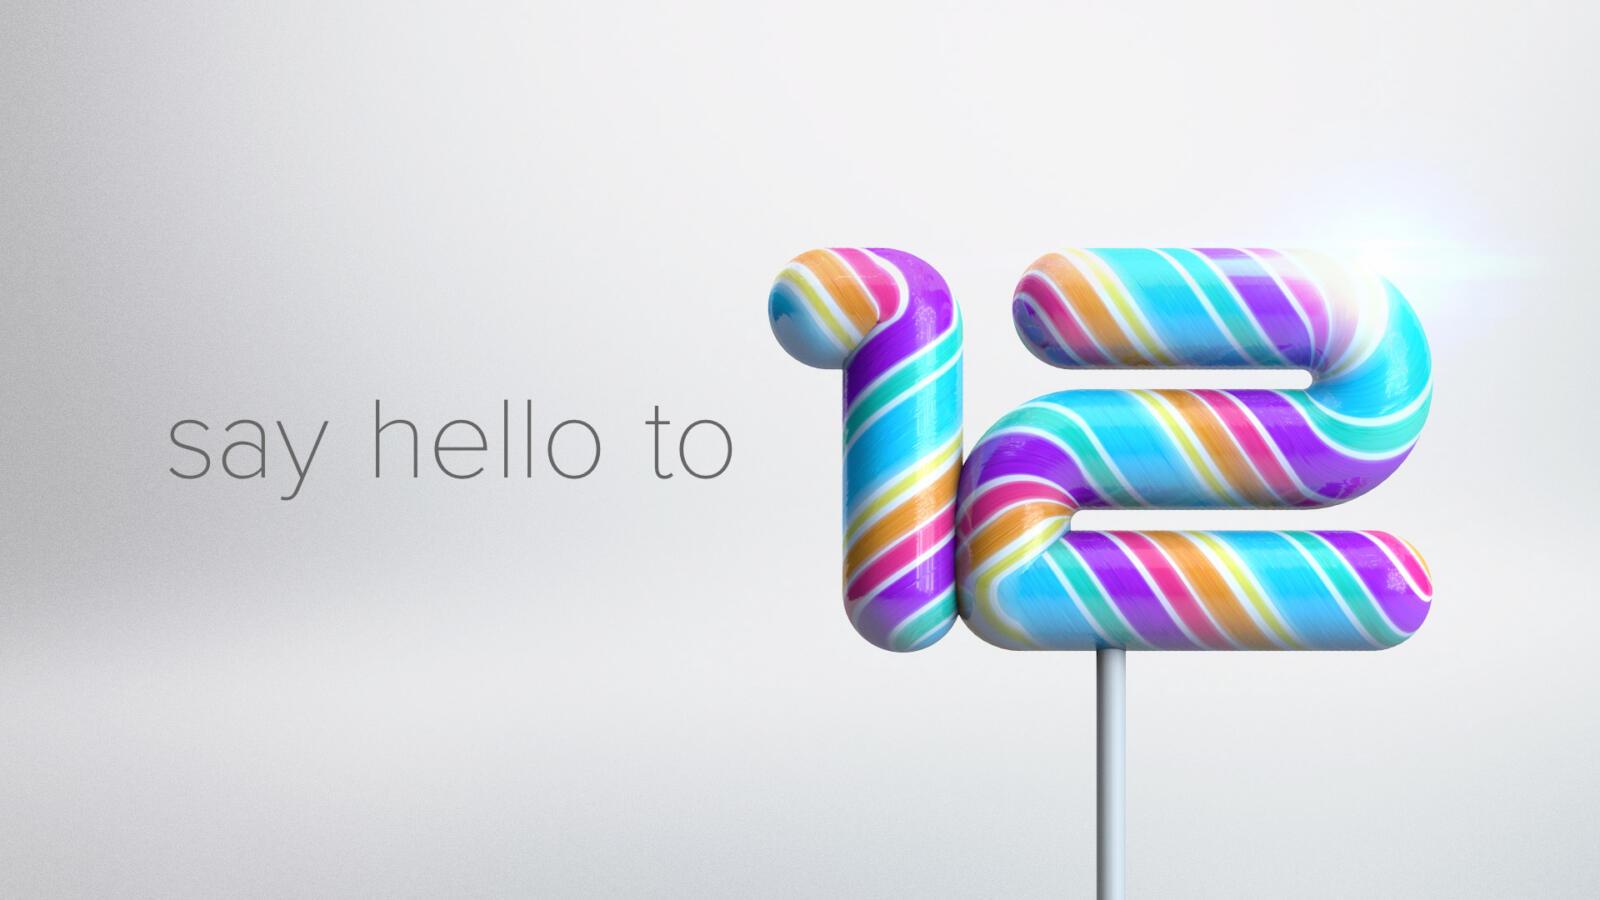 12 Android Cyanogen lollipop oneplus